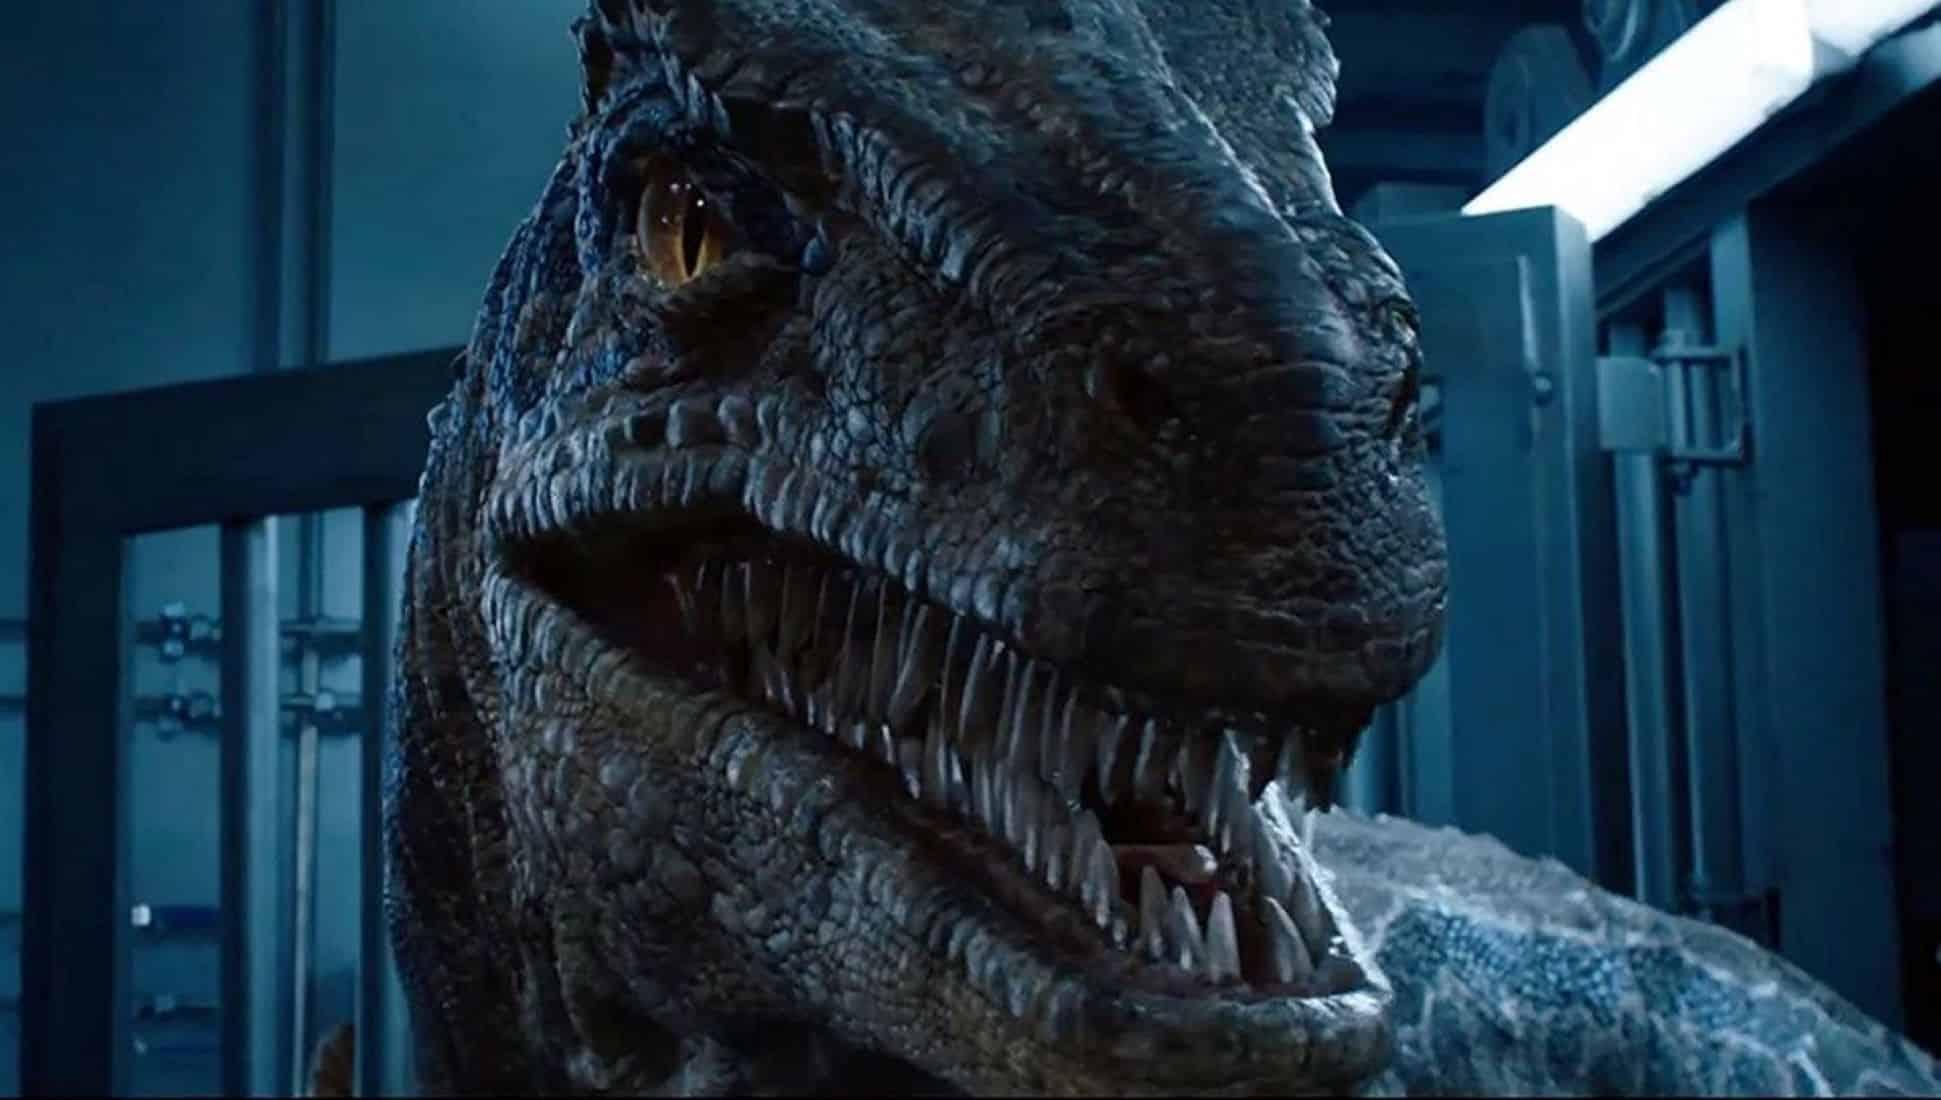 Jurassic World: Dominion Jurassic World 3 Colin Trevorrow